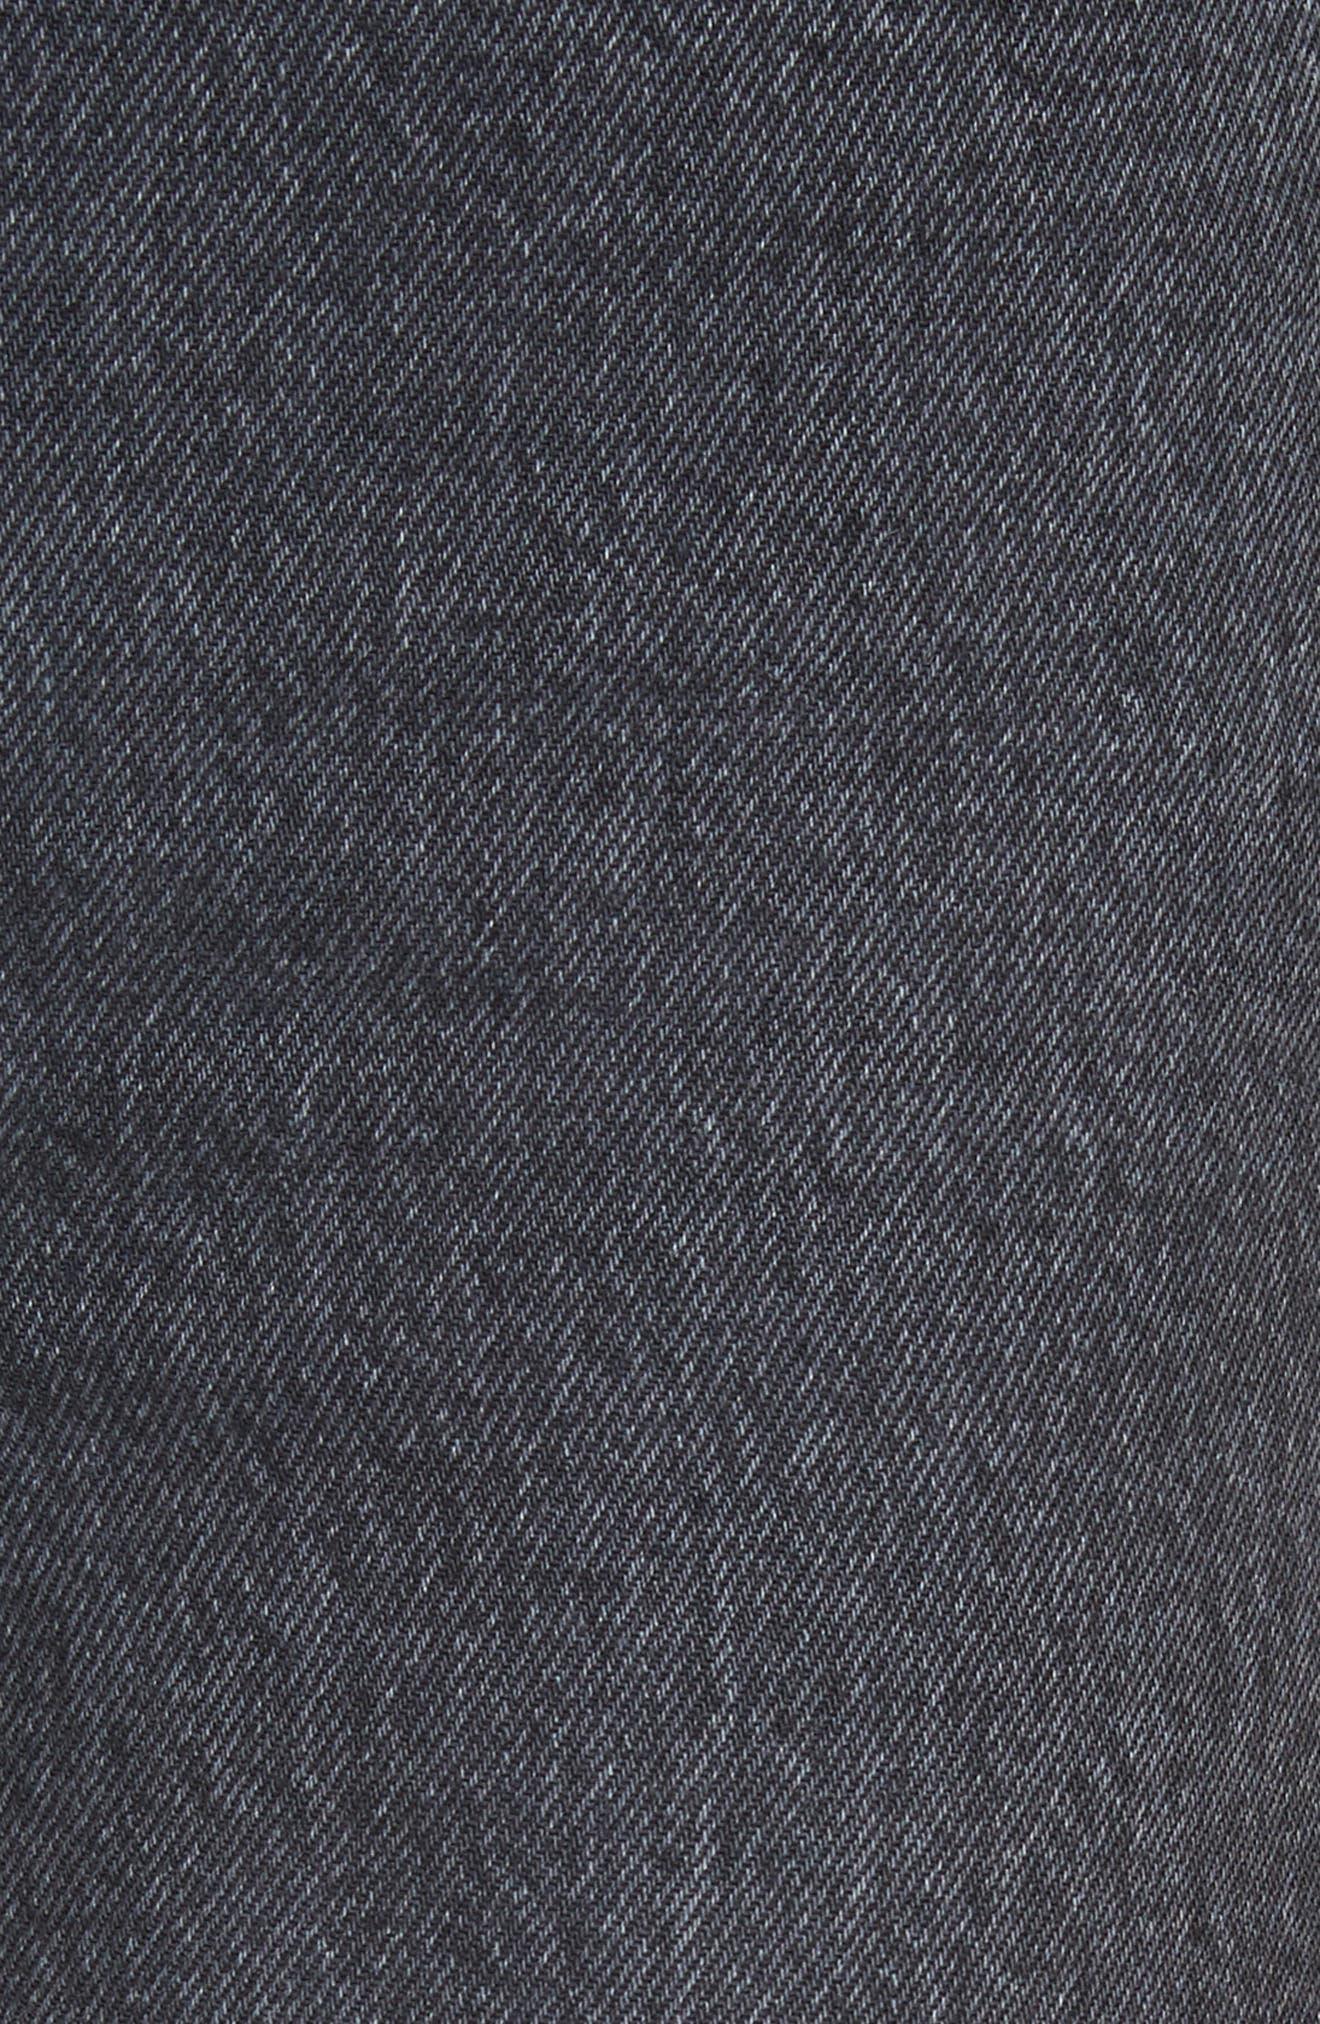 Dylan High Waist Crop Kick Flare Jeans,                             Alternate thumbnail 5, color,                             021